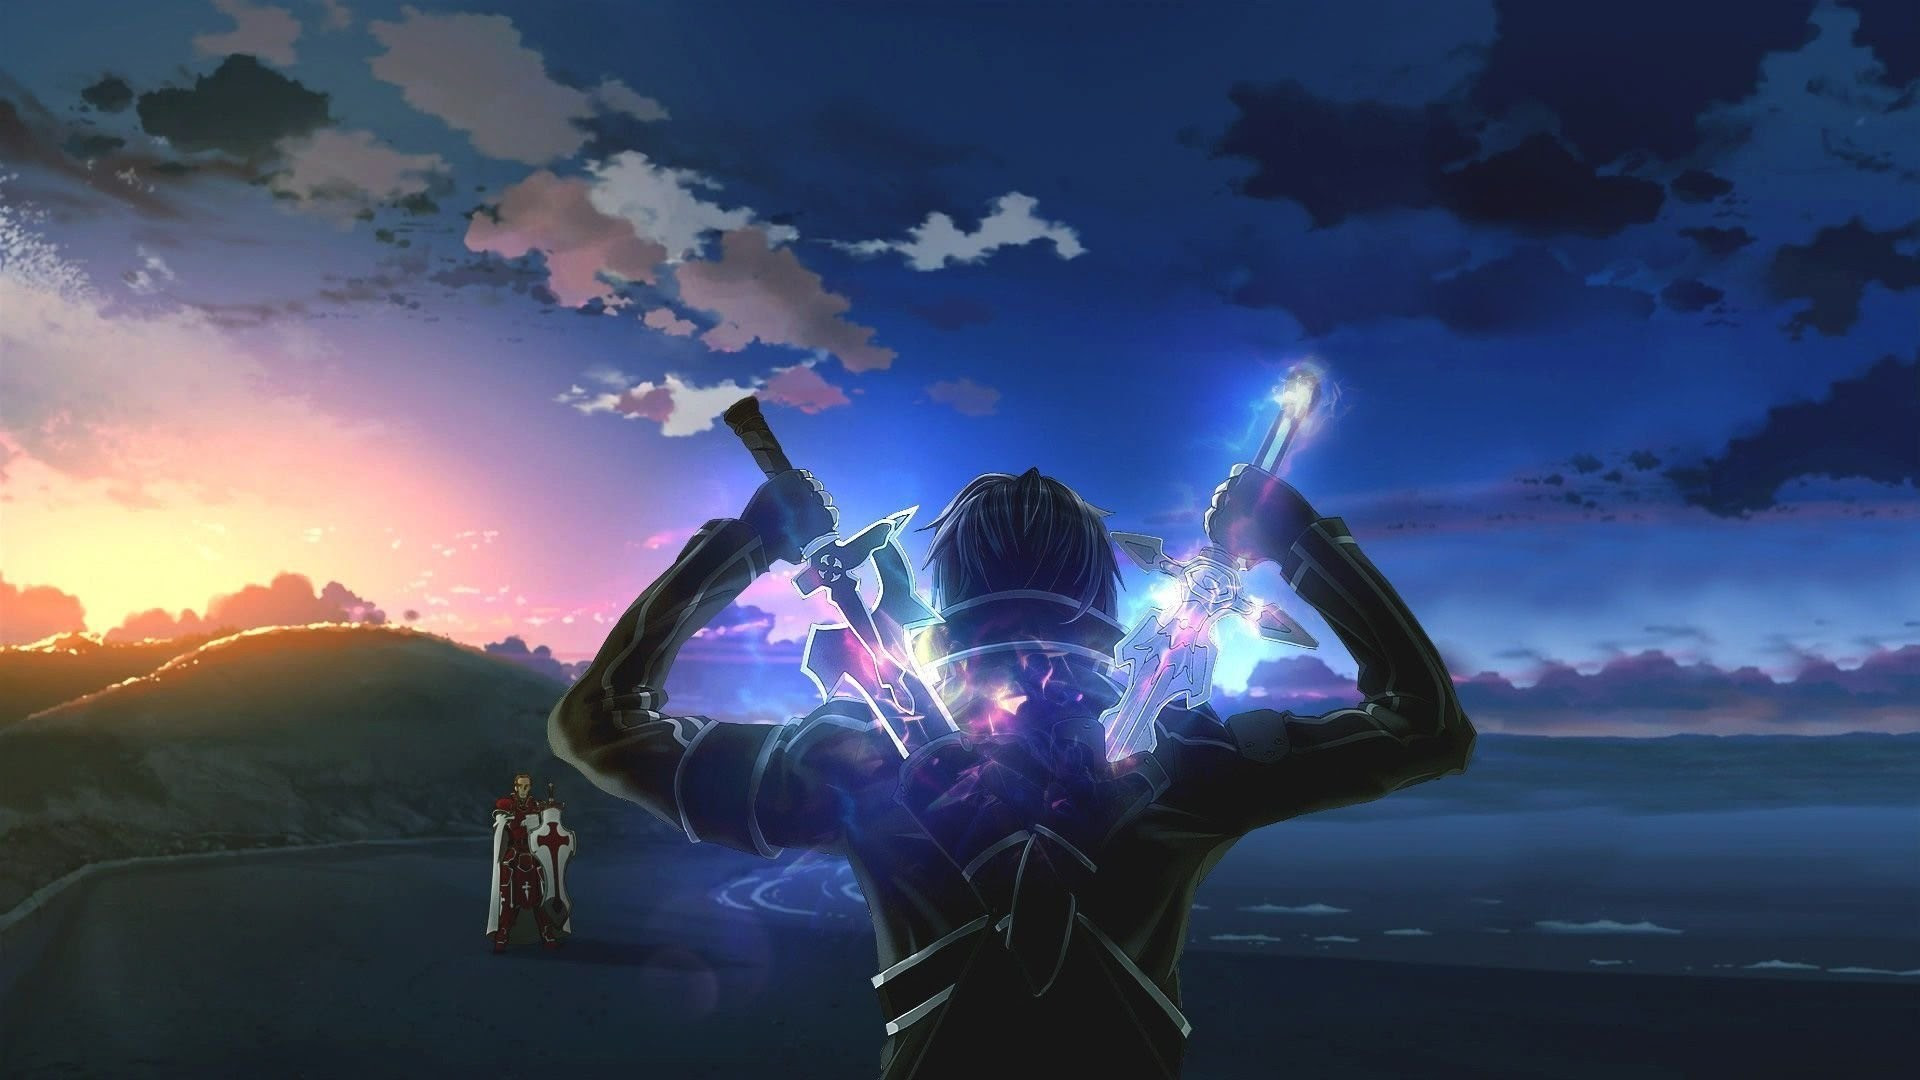 Sword Art Online Wallpaper Kirito 81 Images